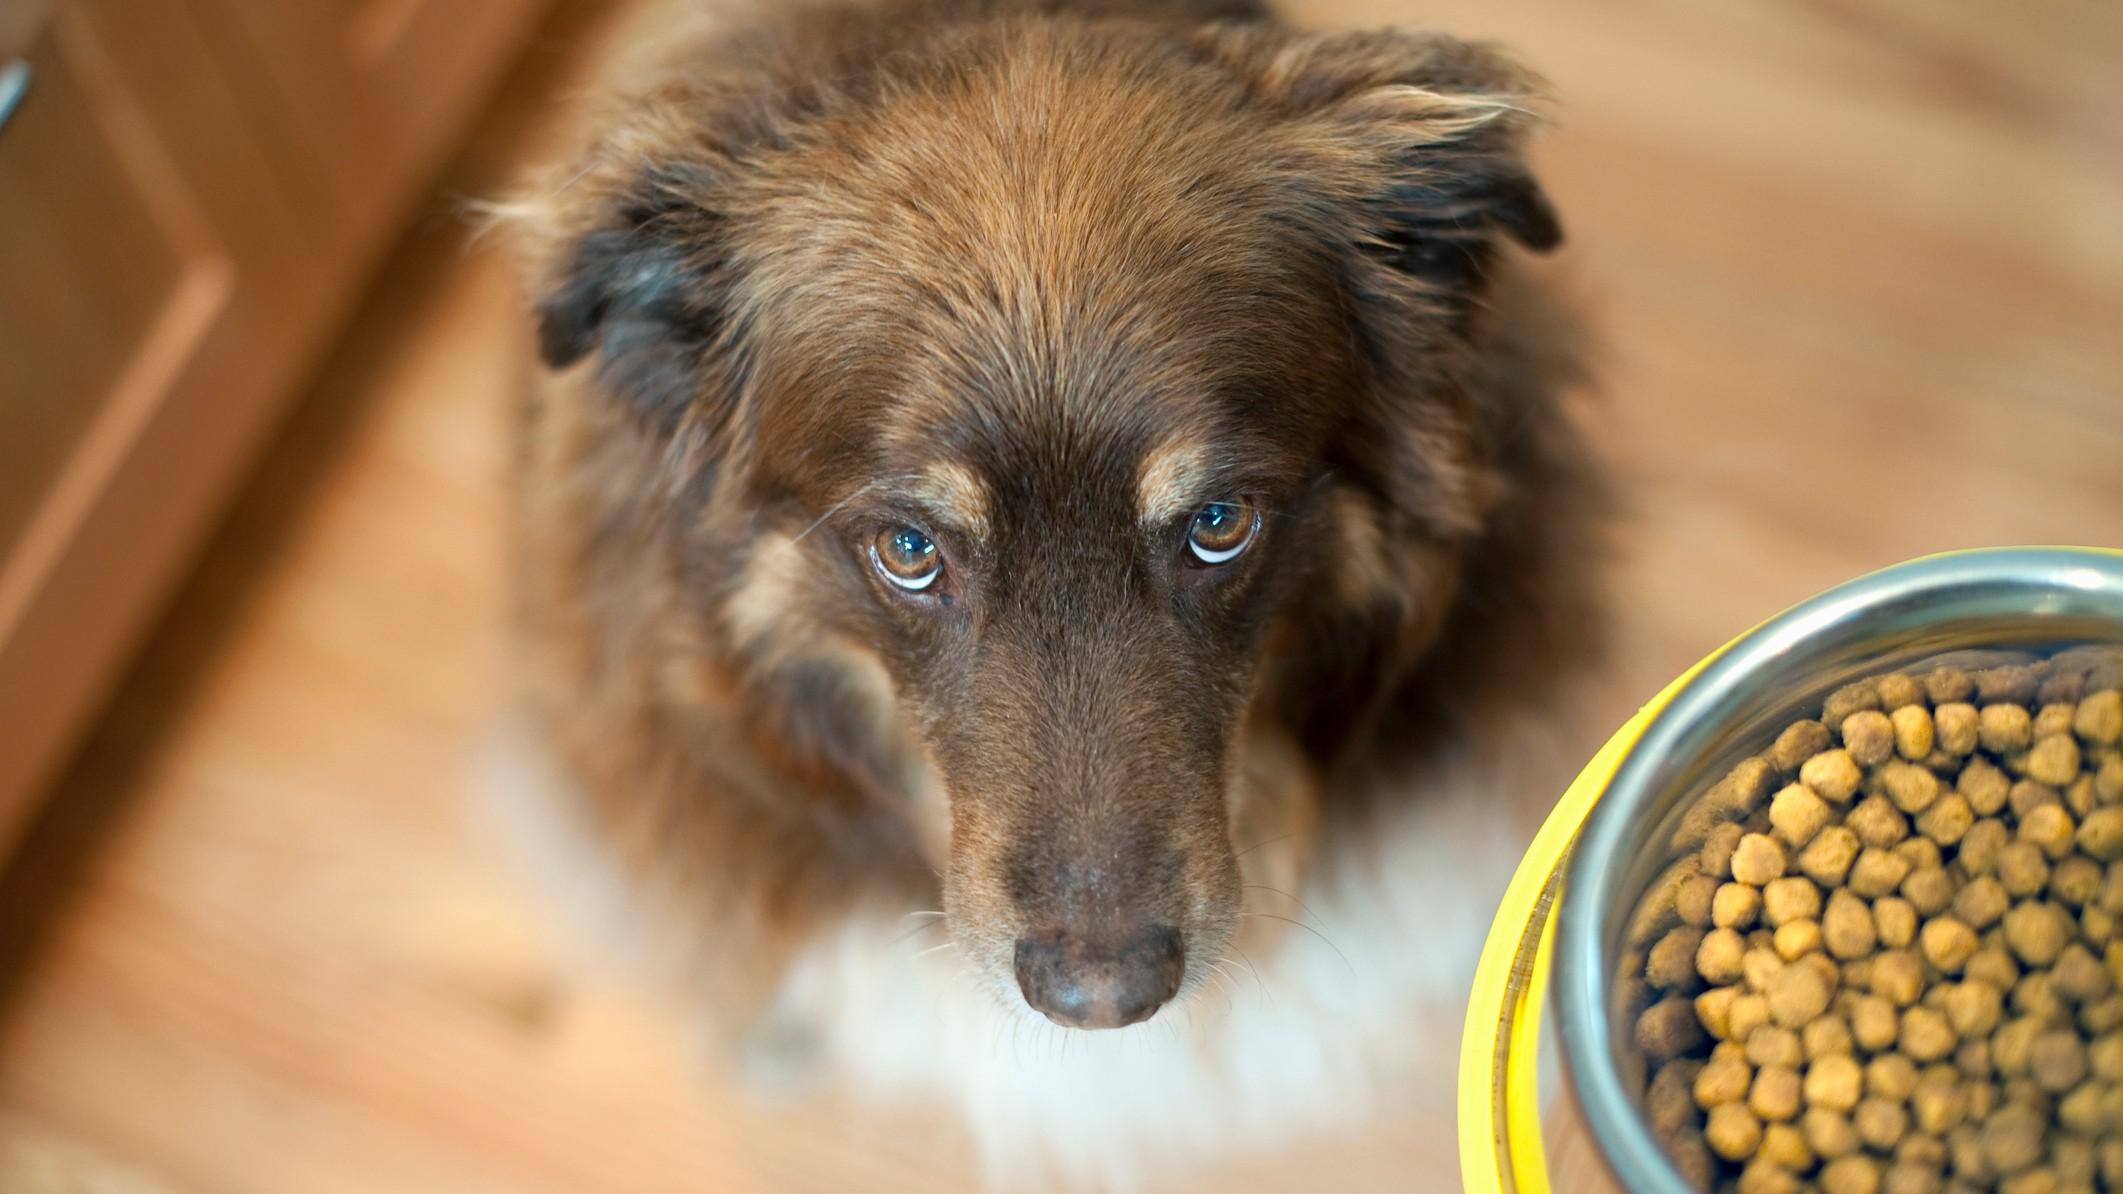 What Happens When A Human Eats Pet Food